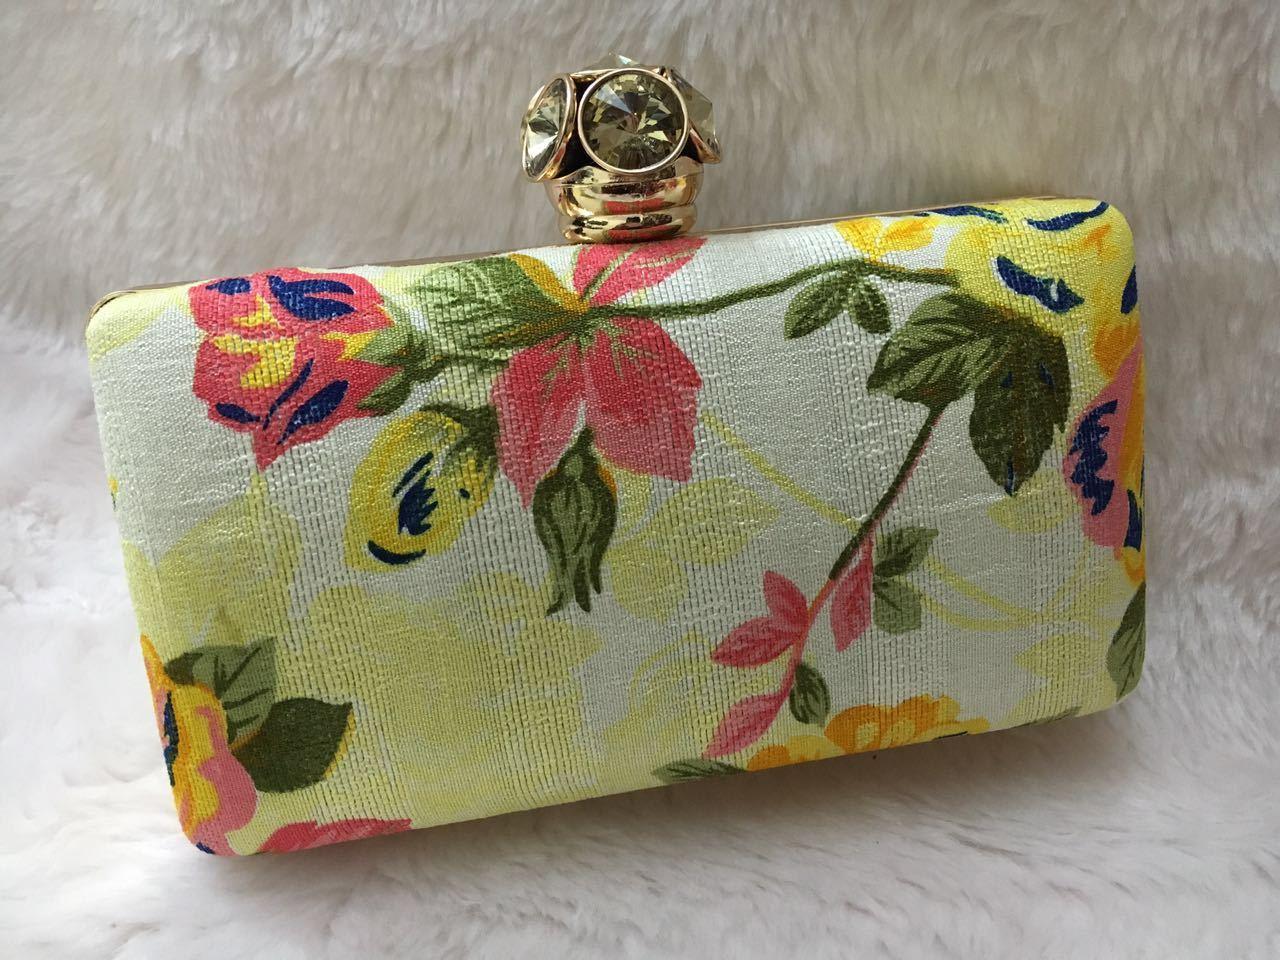 Designer Floral Print Box Clutch Bag